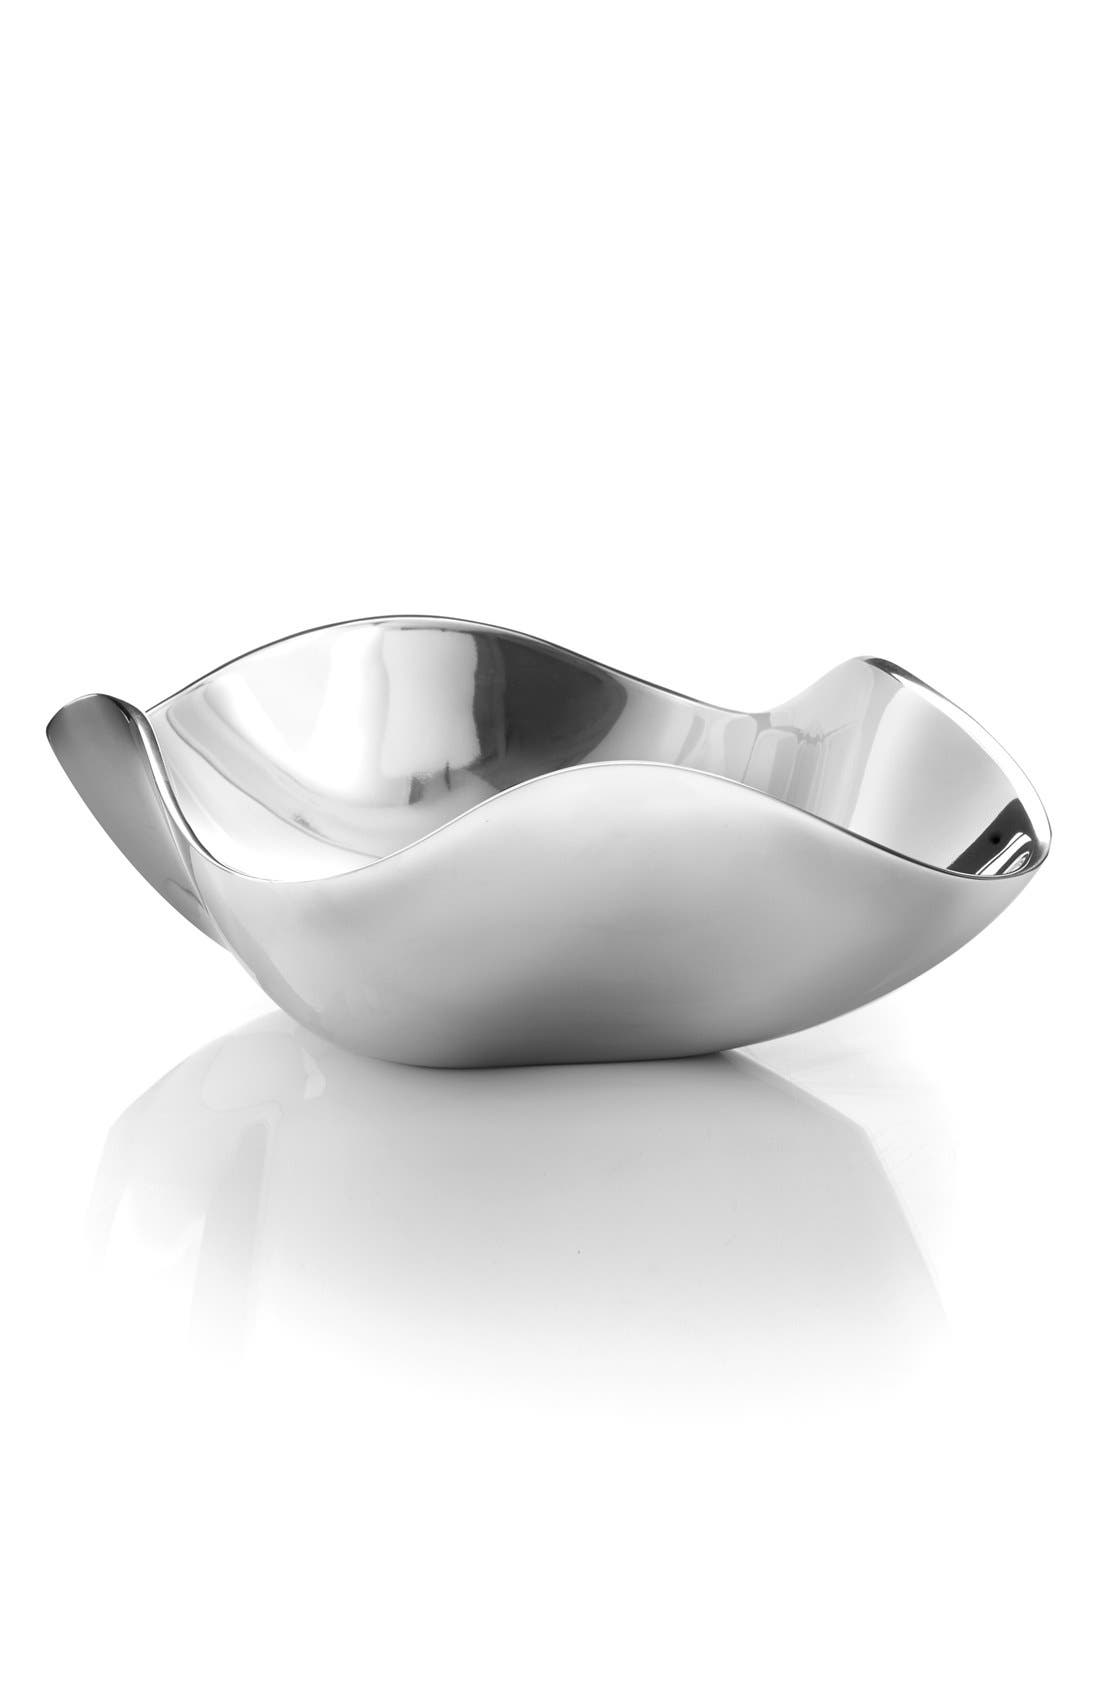 Oceana Serving Bowl,                             Main thumbnail 1, color,                             040